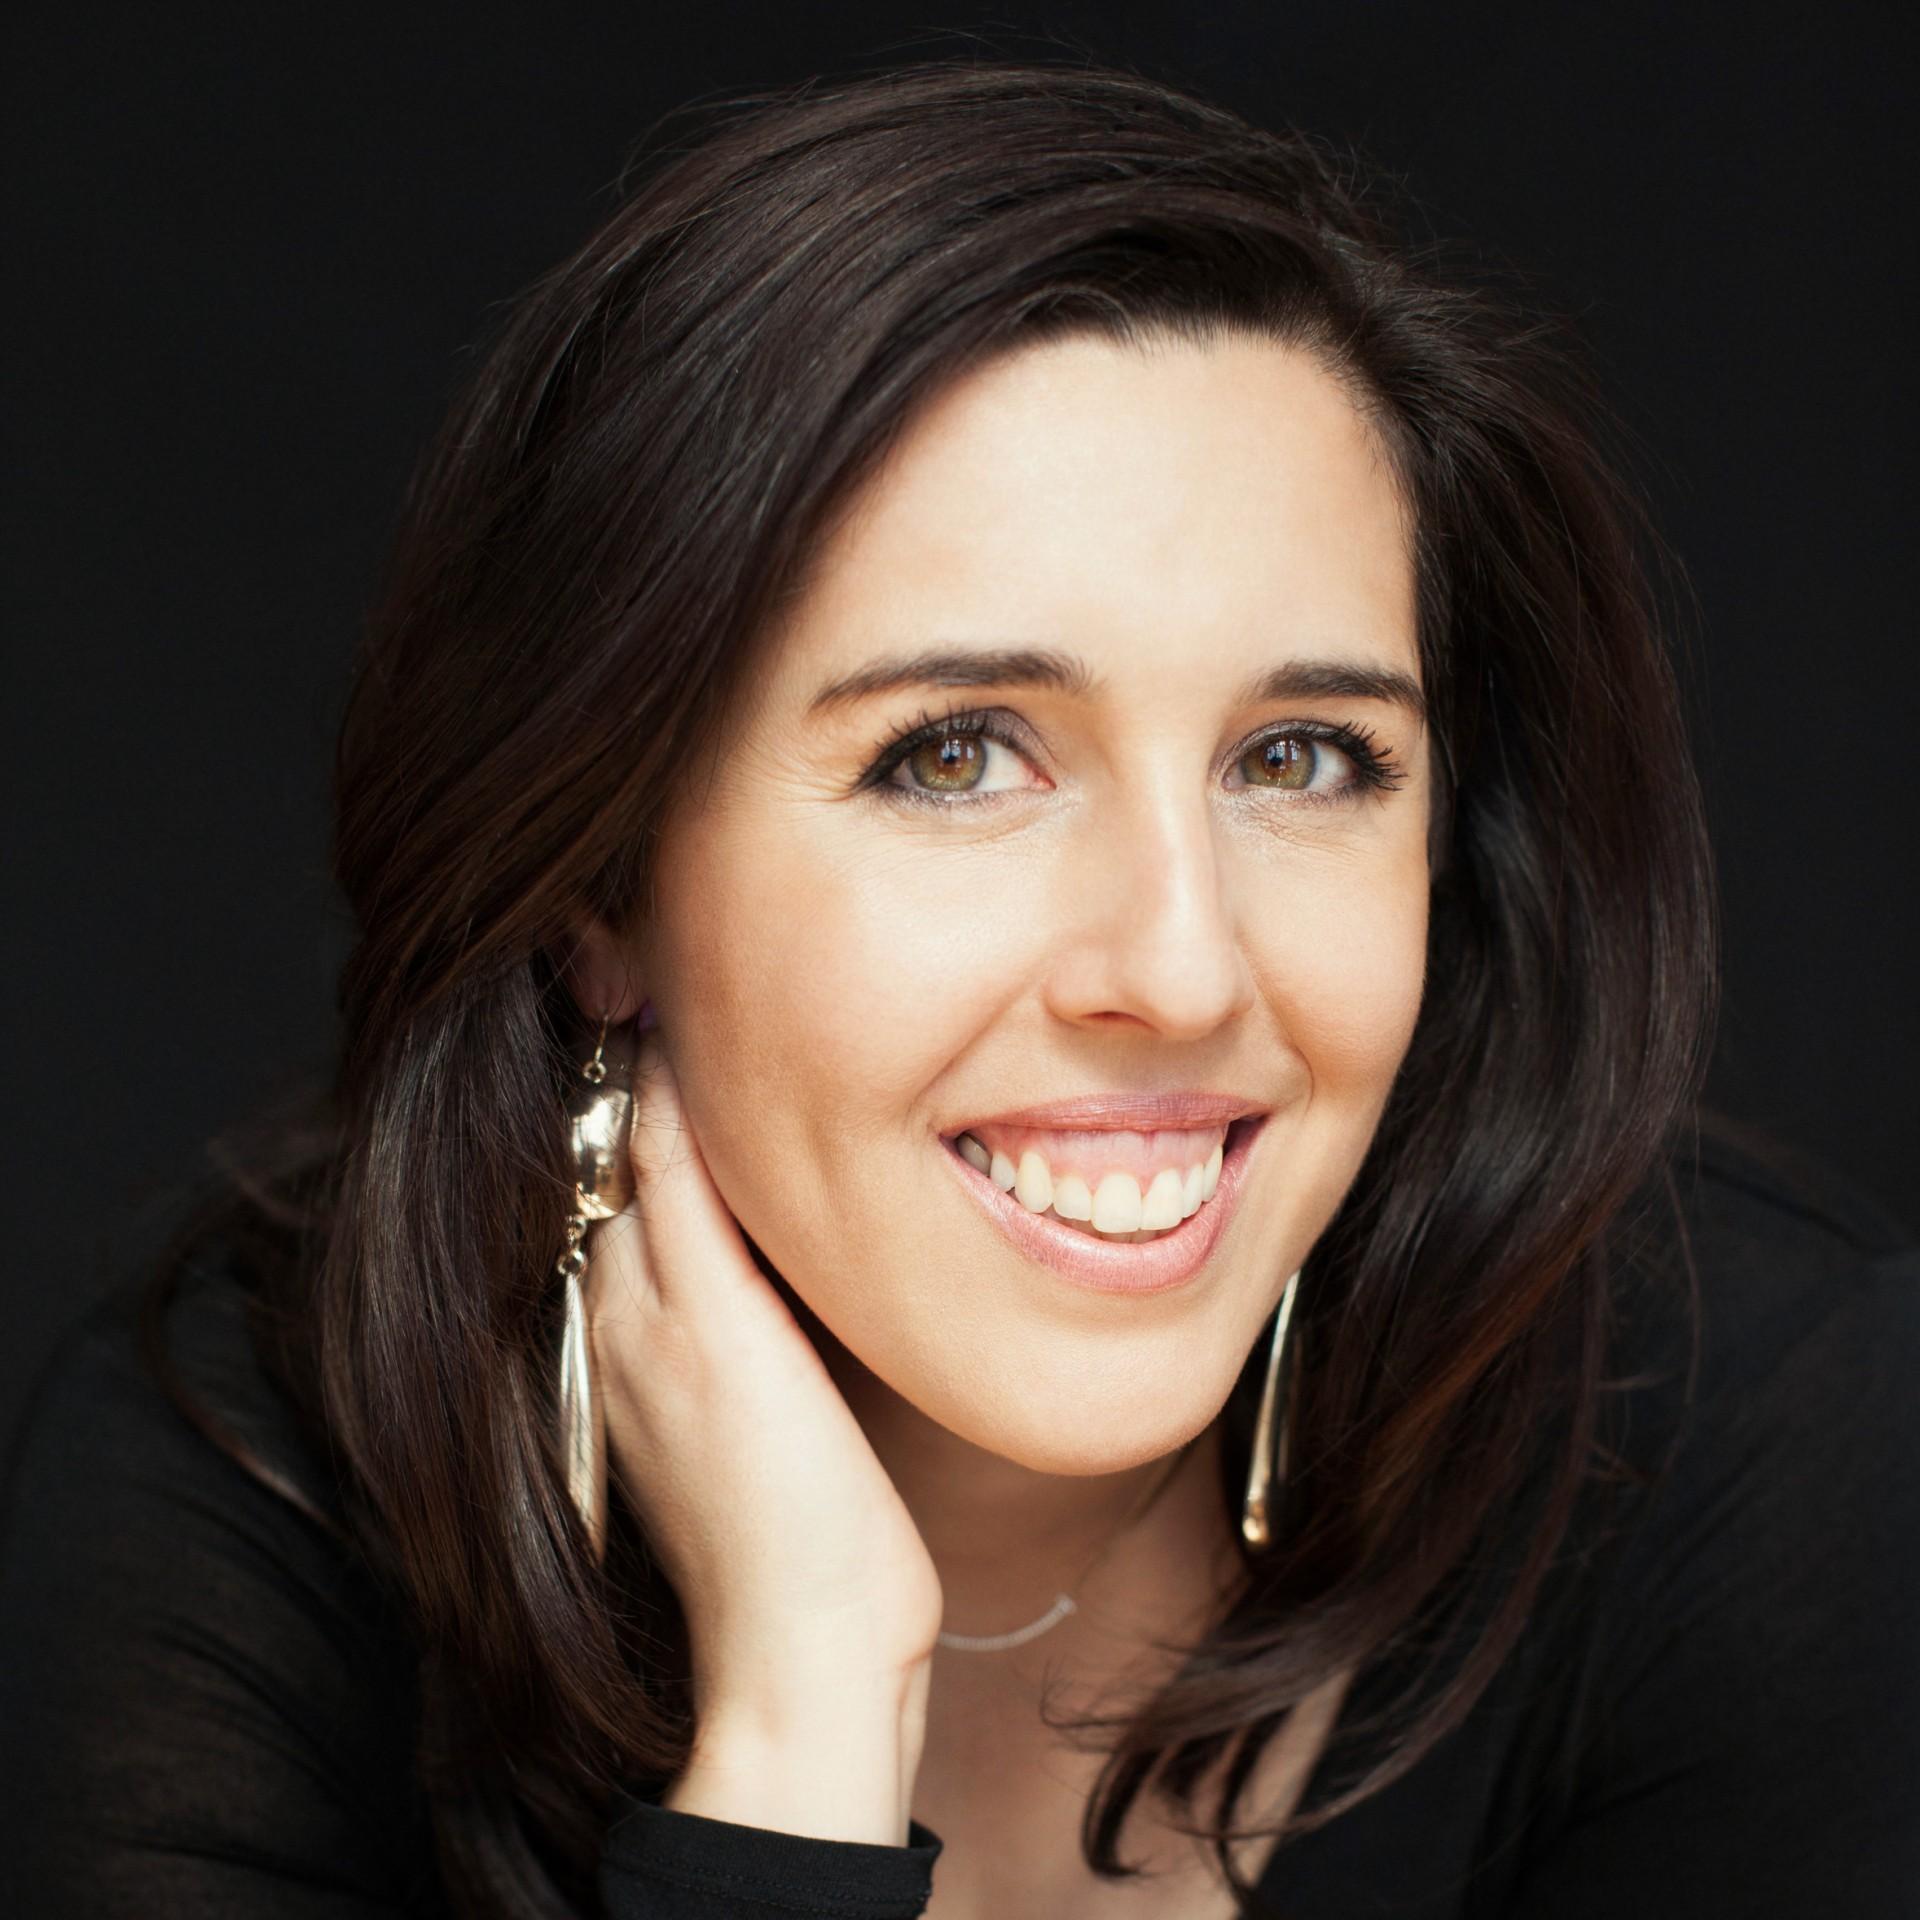 Square Author Natalie Setareh Be Your Own Makeup Artist copy